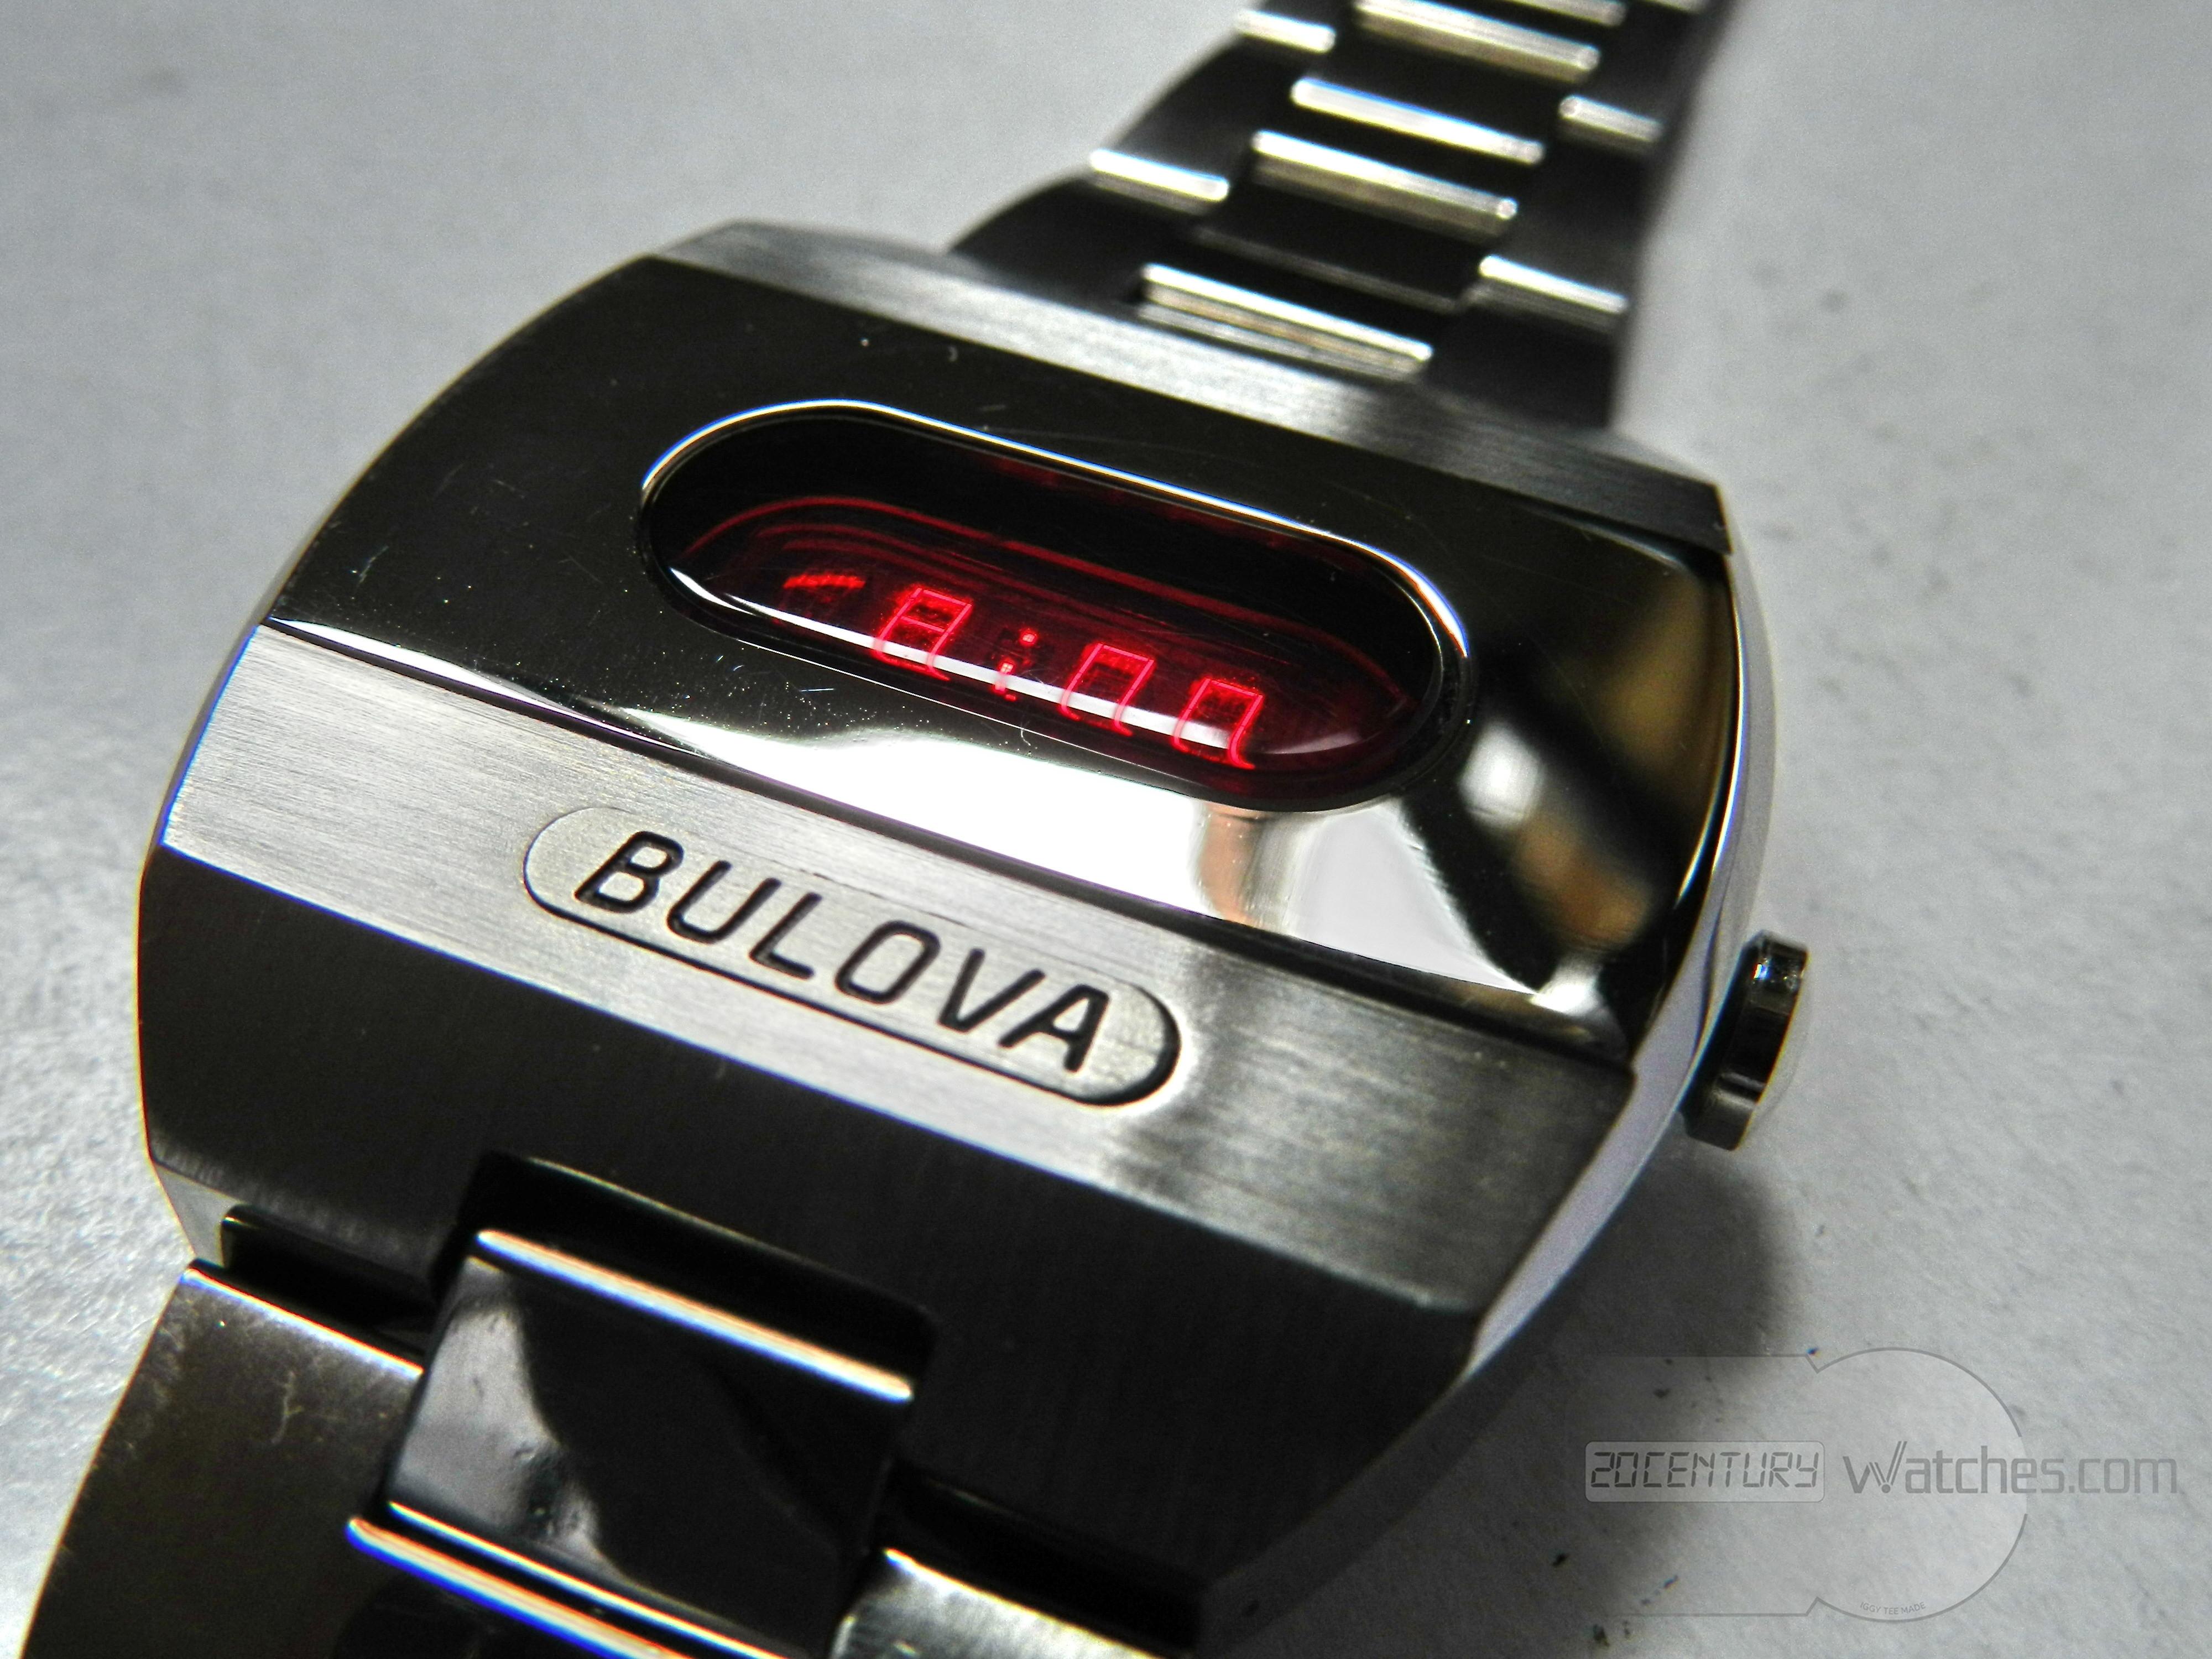 Bulova Big Block